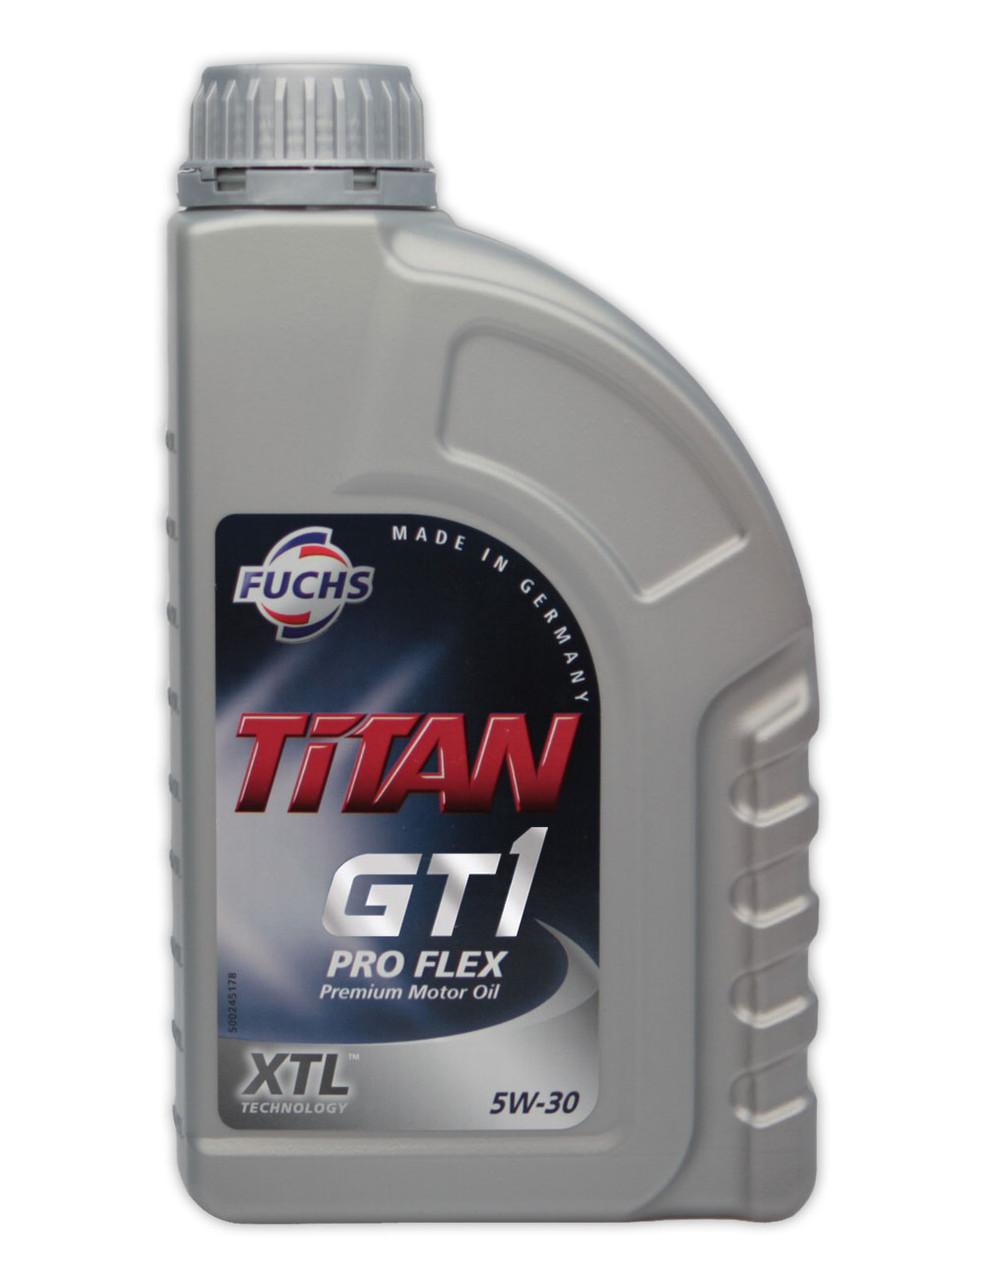 Масло моторное FUCHS TITAN GT 1 PRO FLEX 5W30 XTL 1L